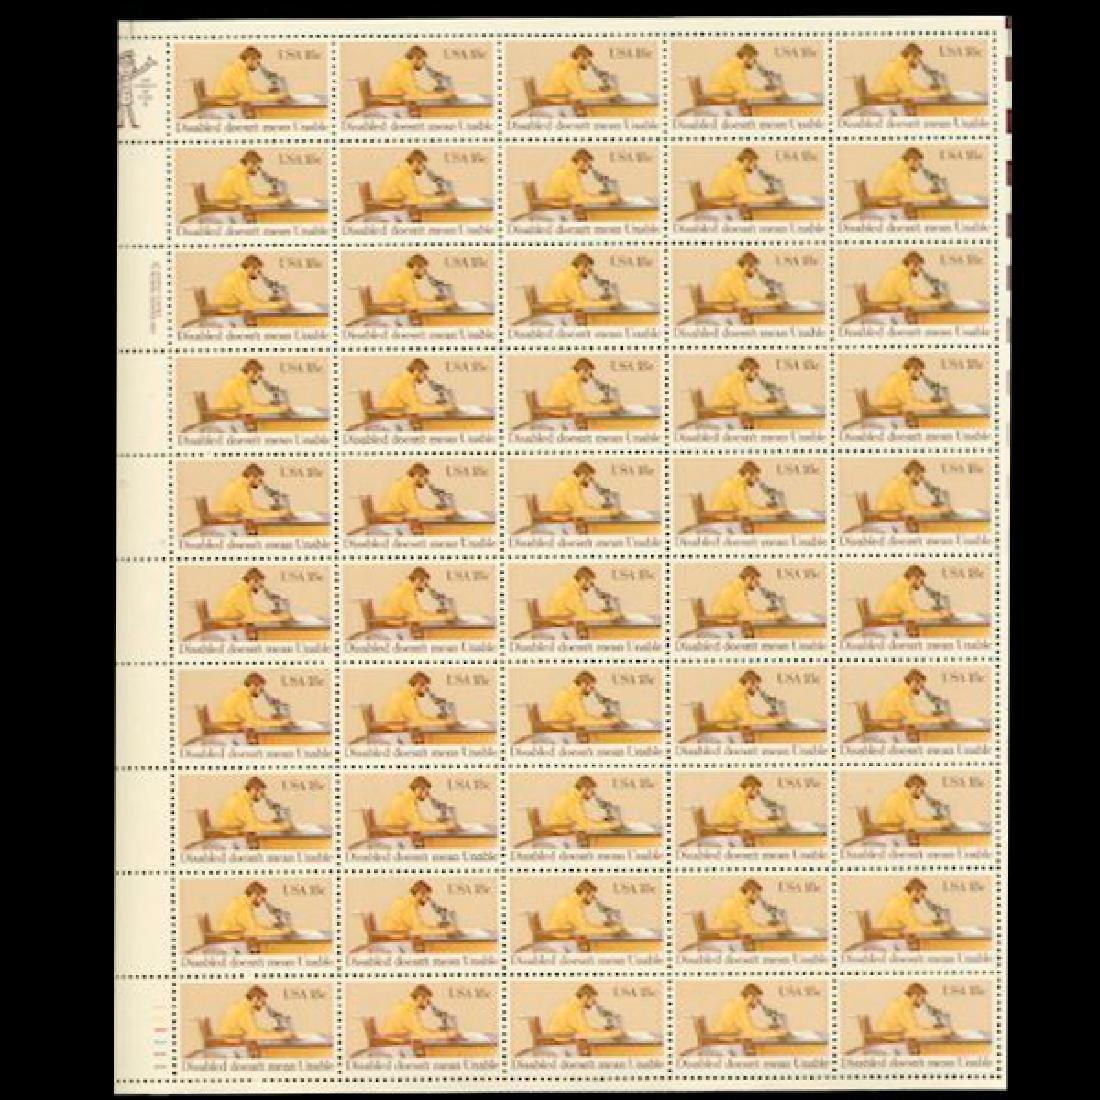 1981 US Sheet 18c Disabled Stamps MNH Errors RARE